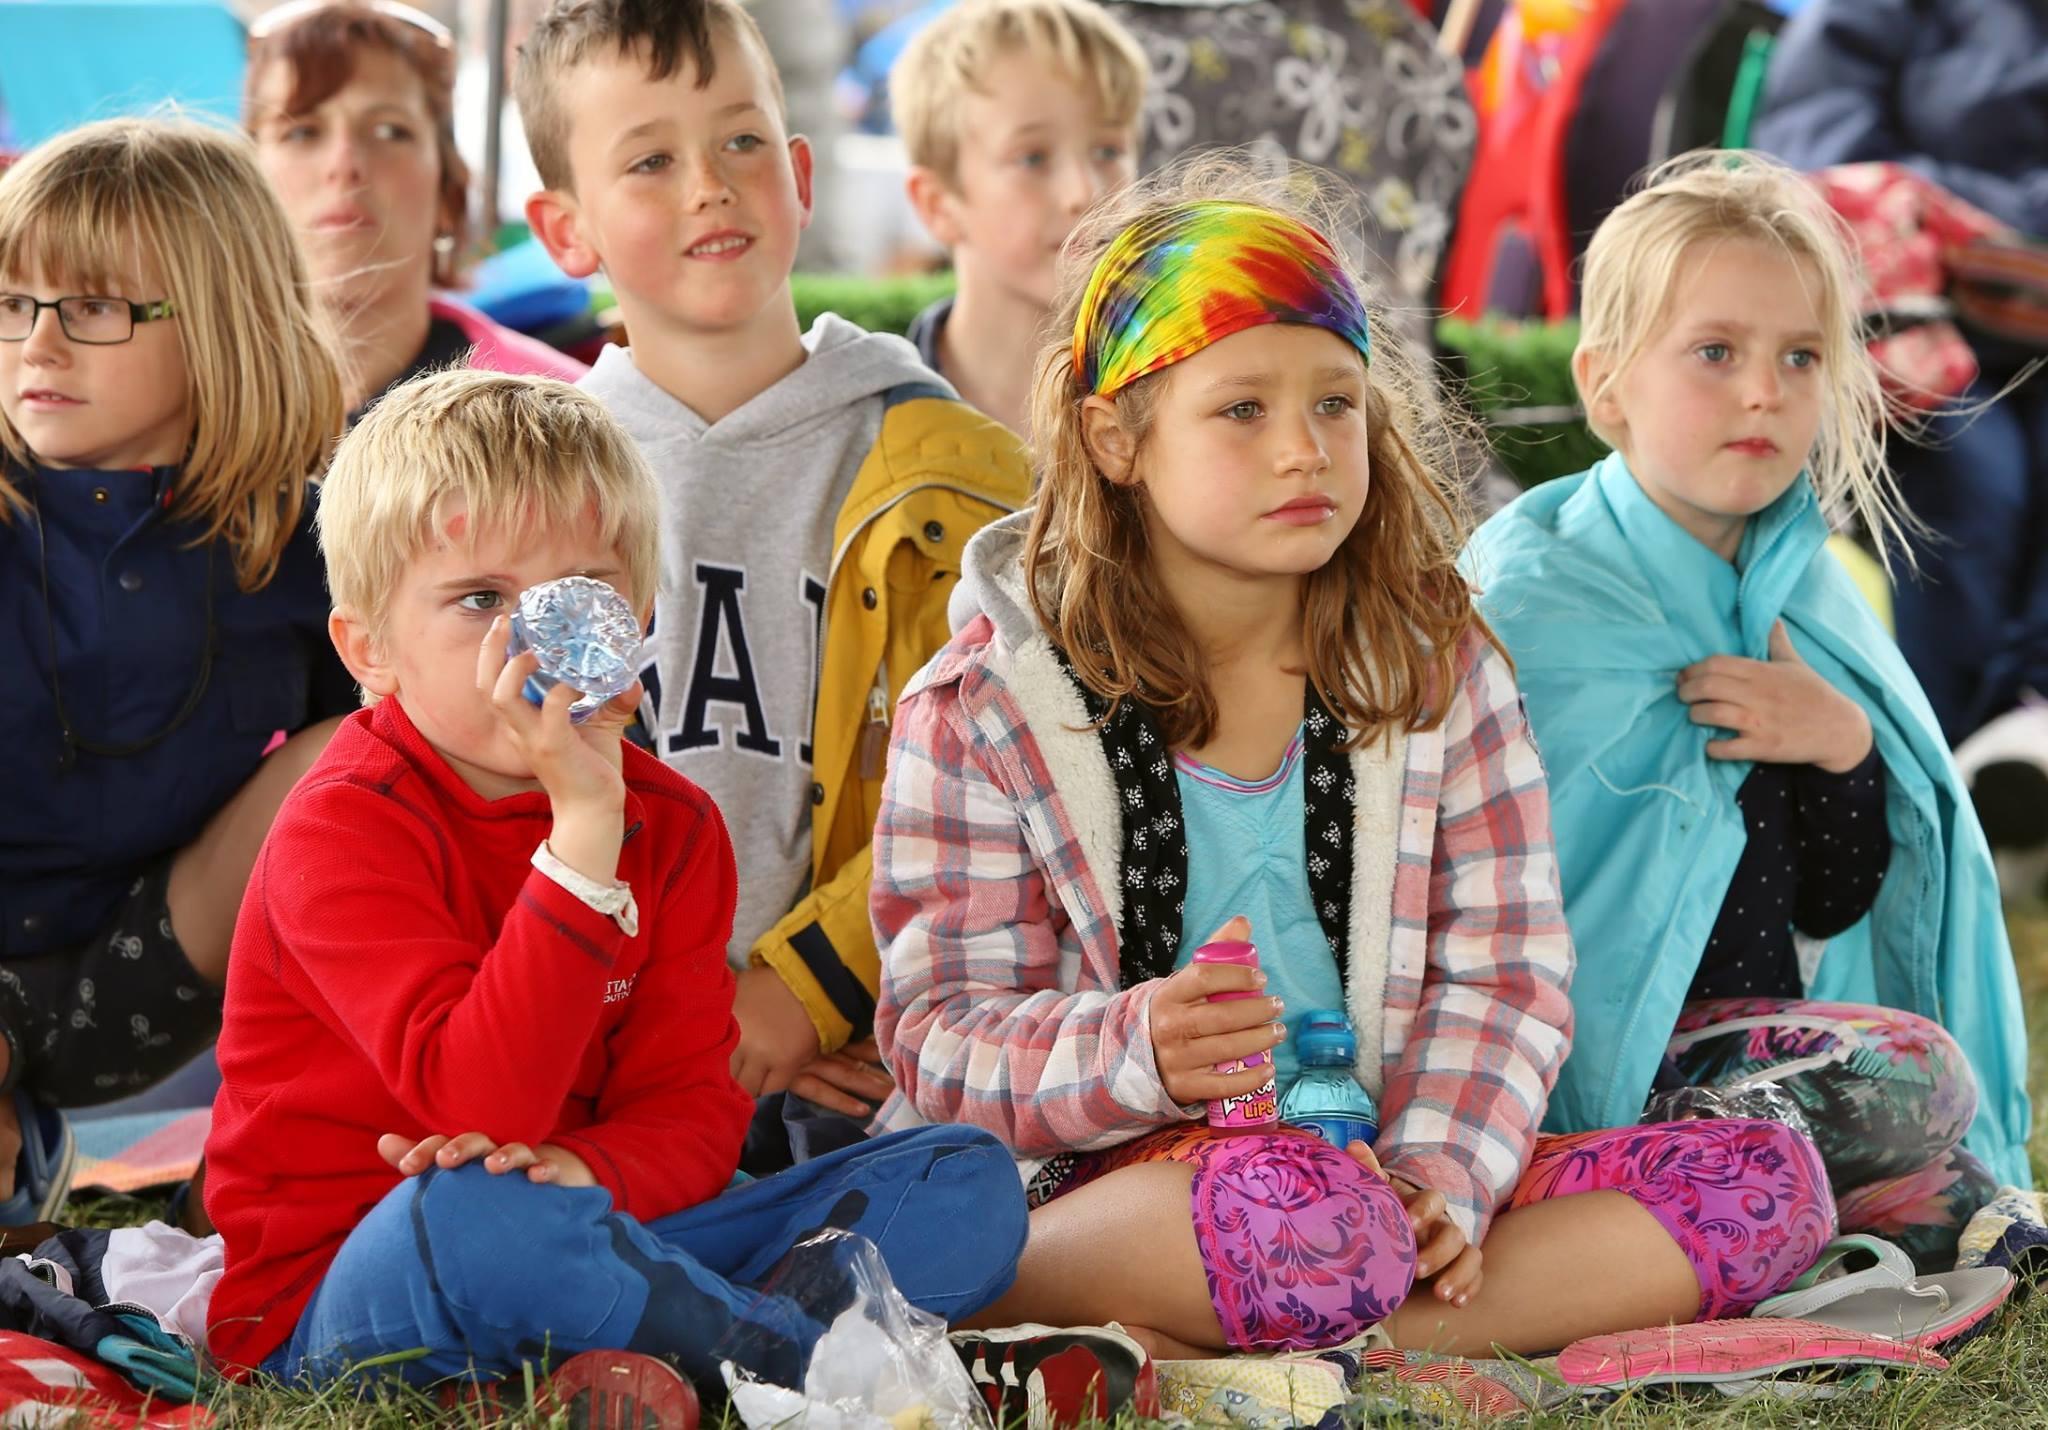 wychwood festival, family friendly festival, best festivals with kids